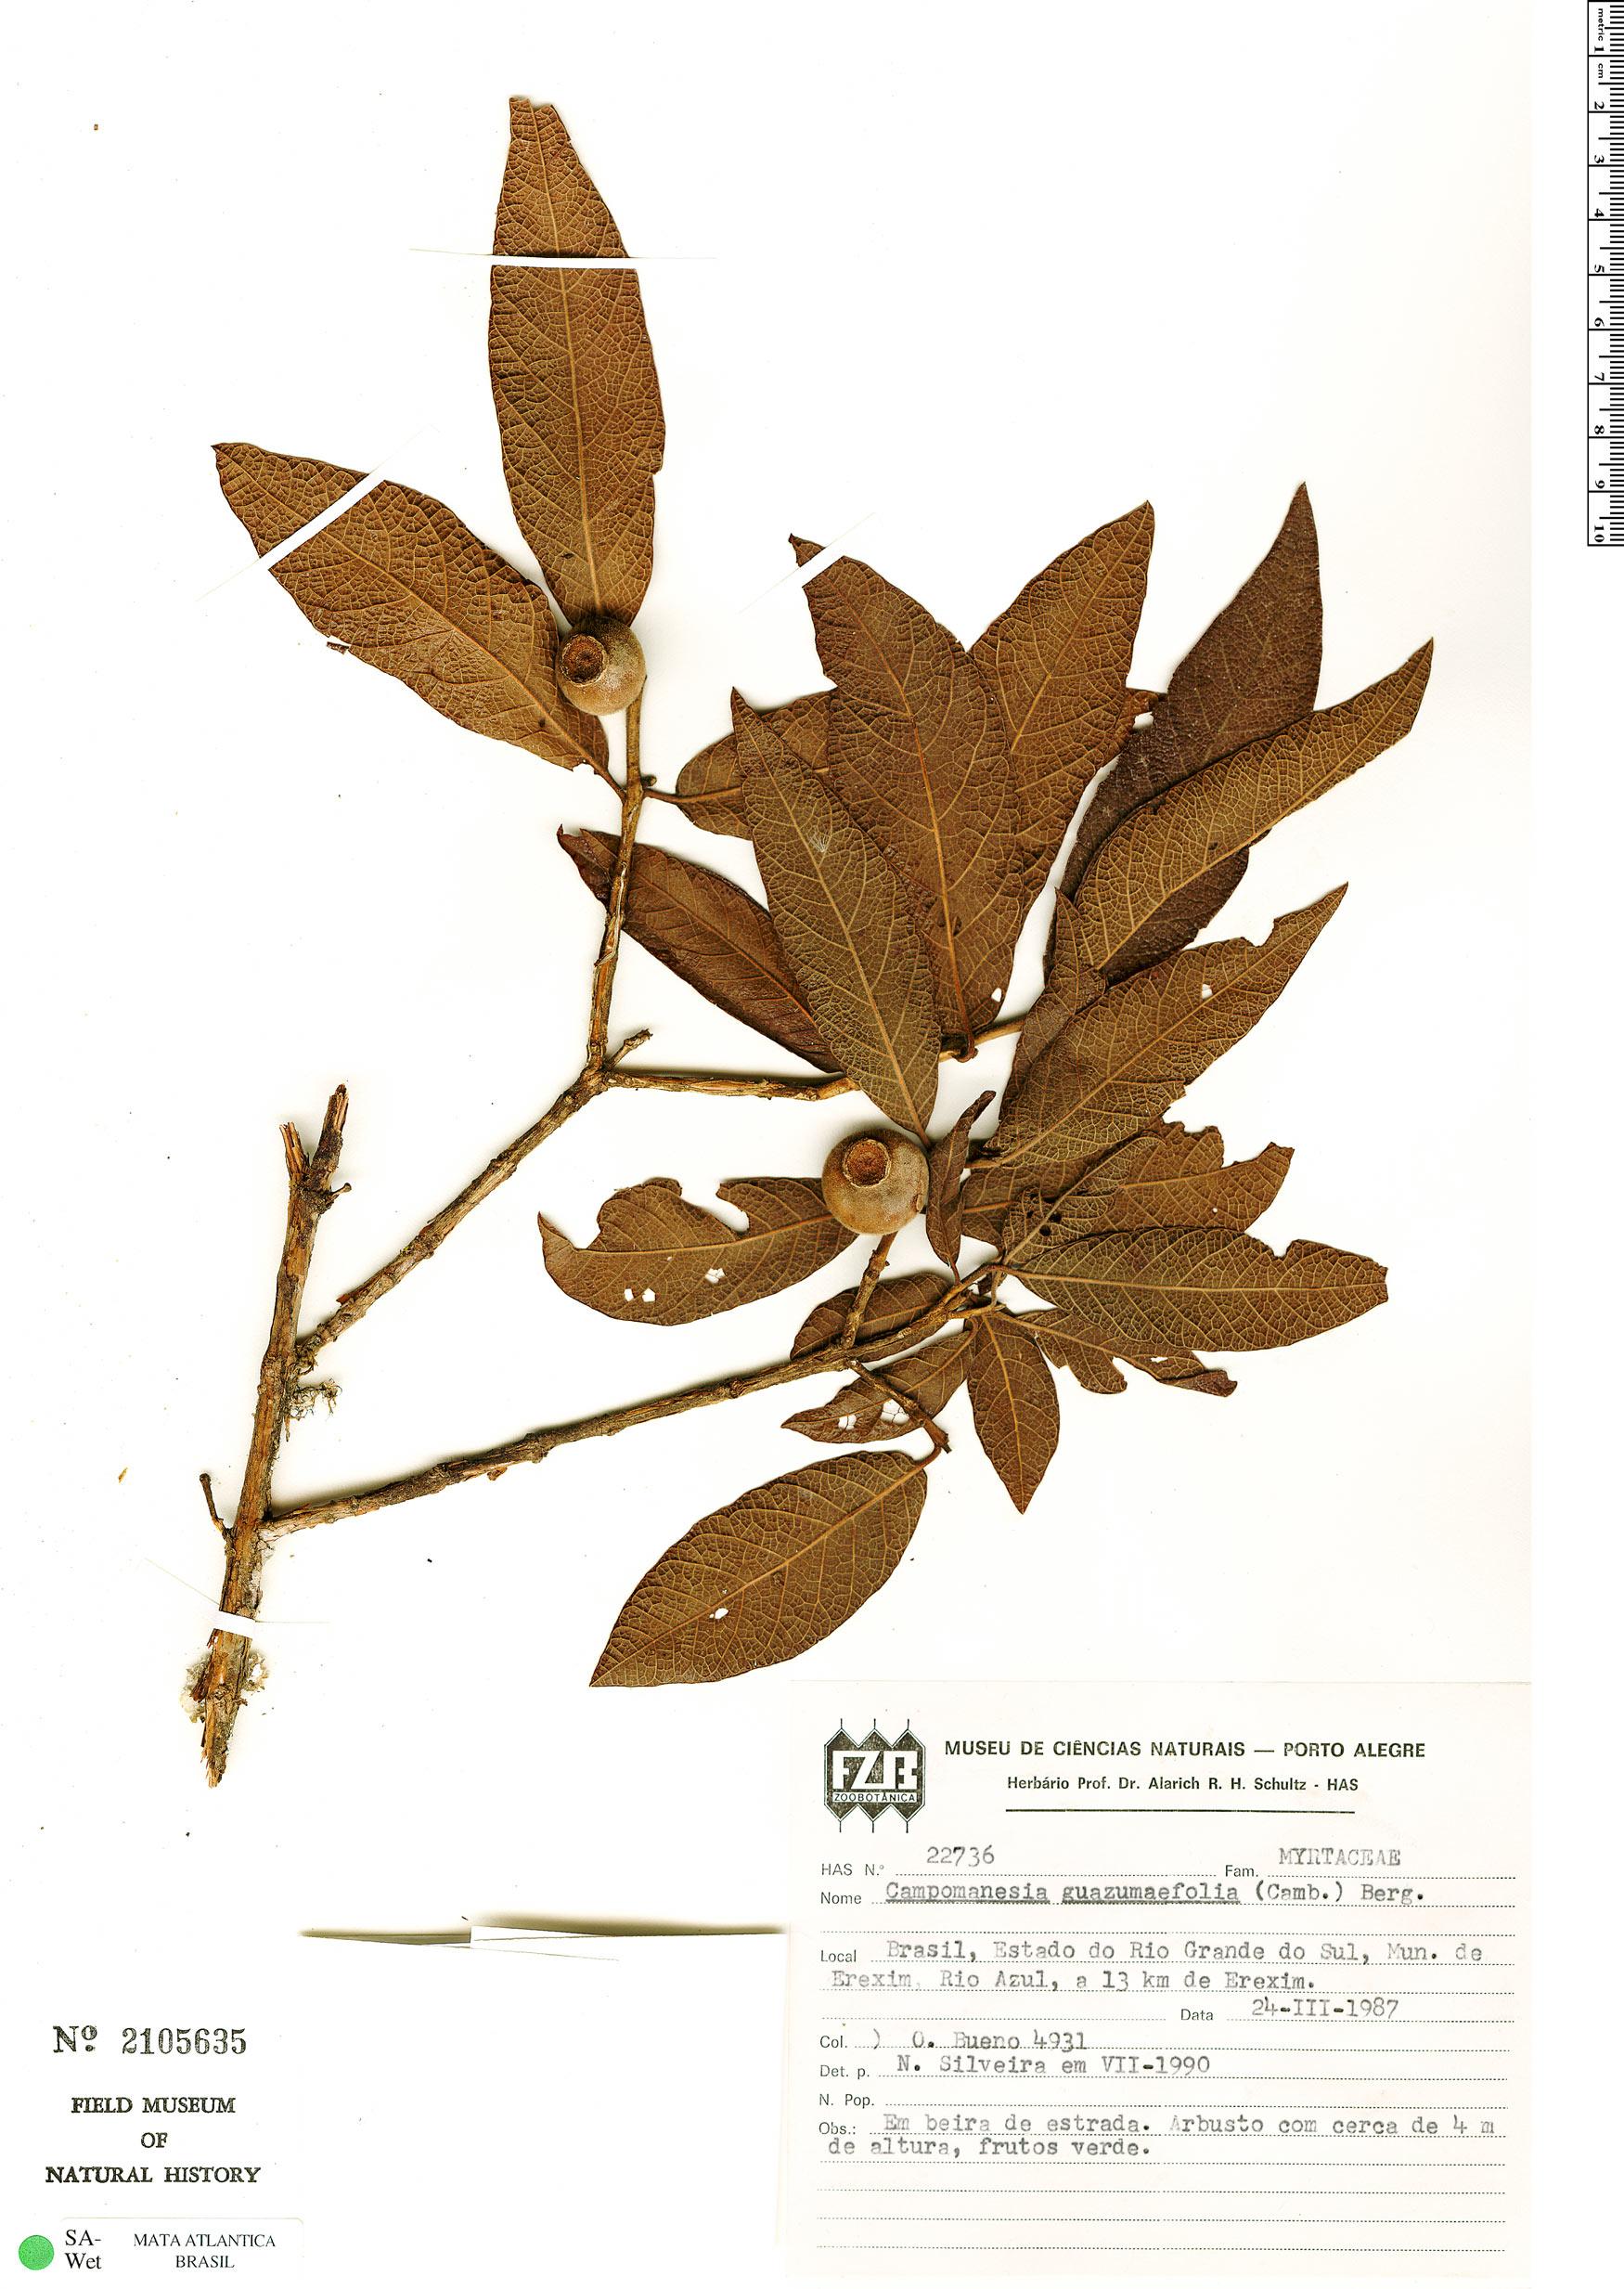 Specimen: Campomanesia guazumifolia